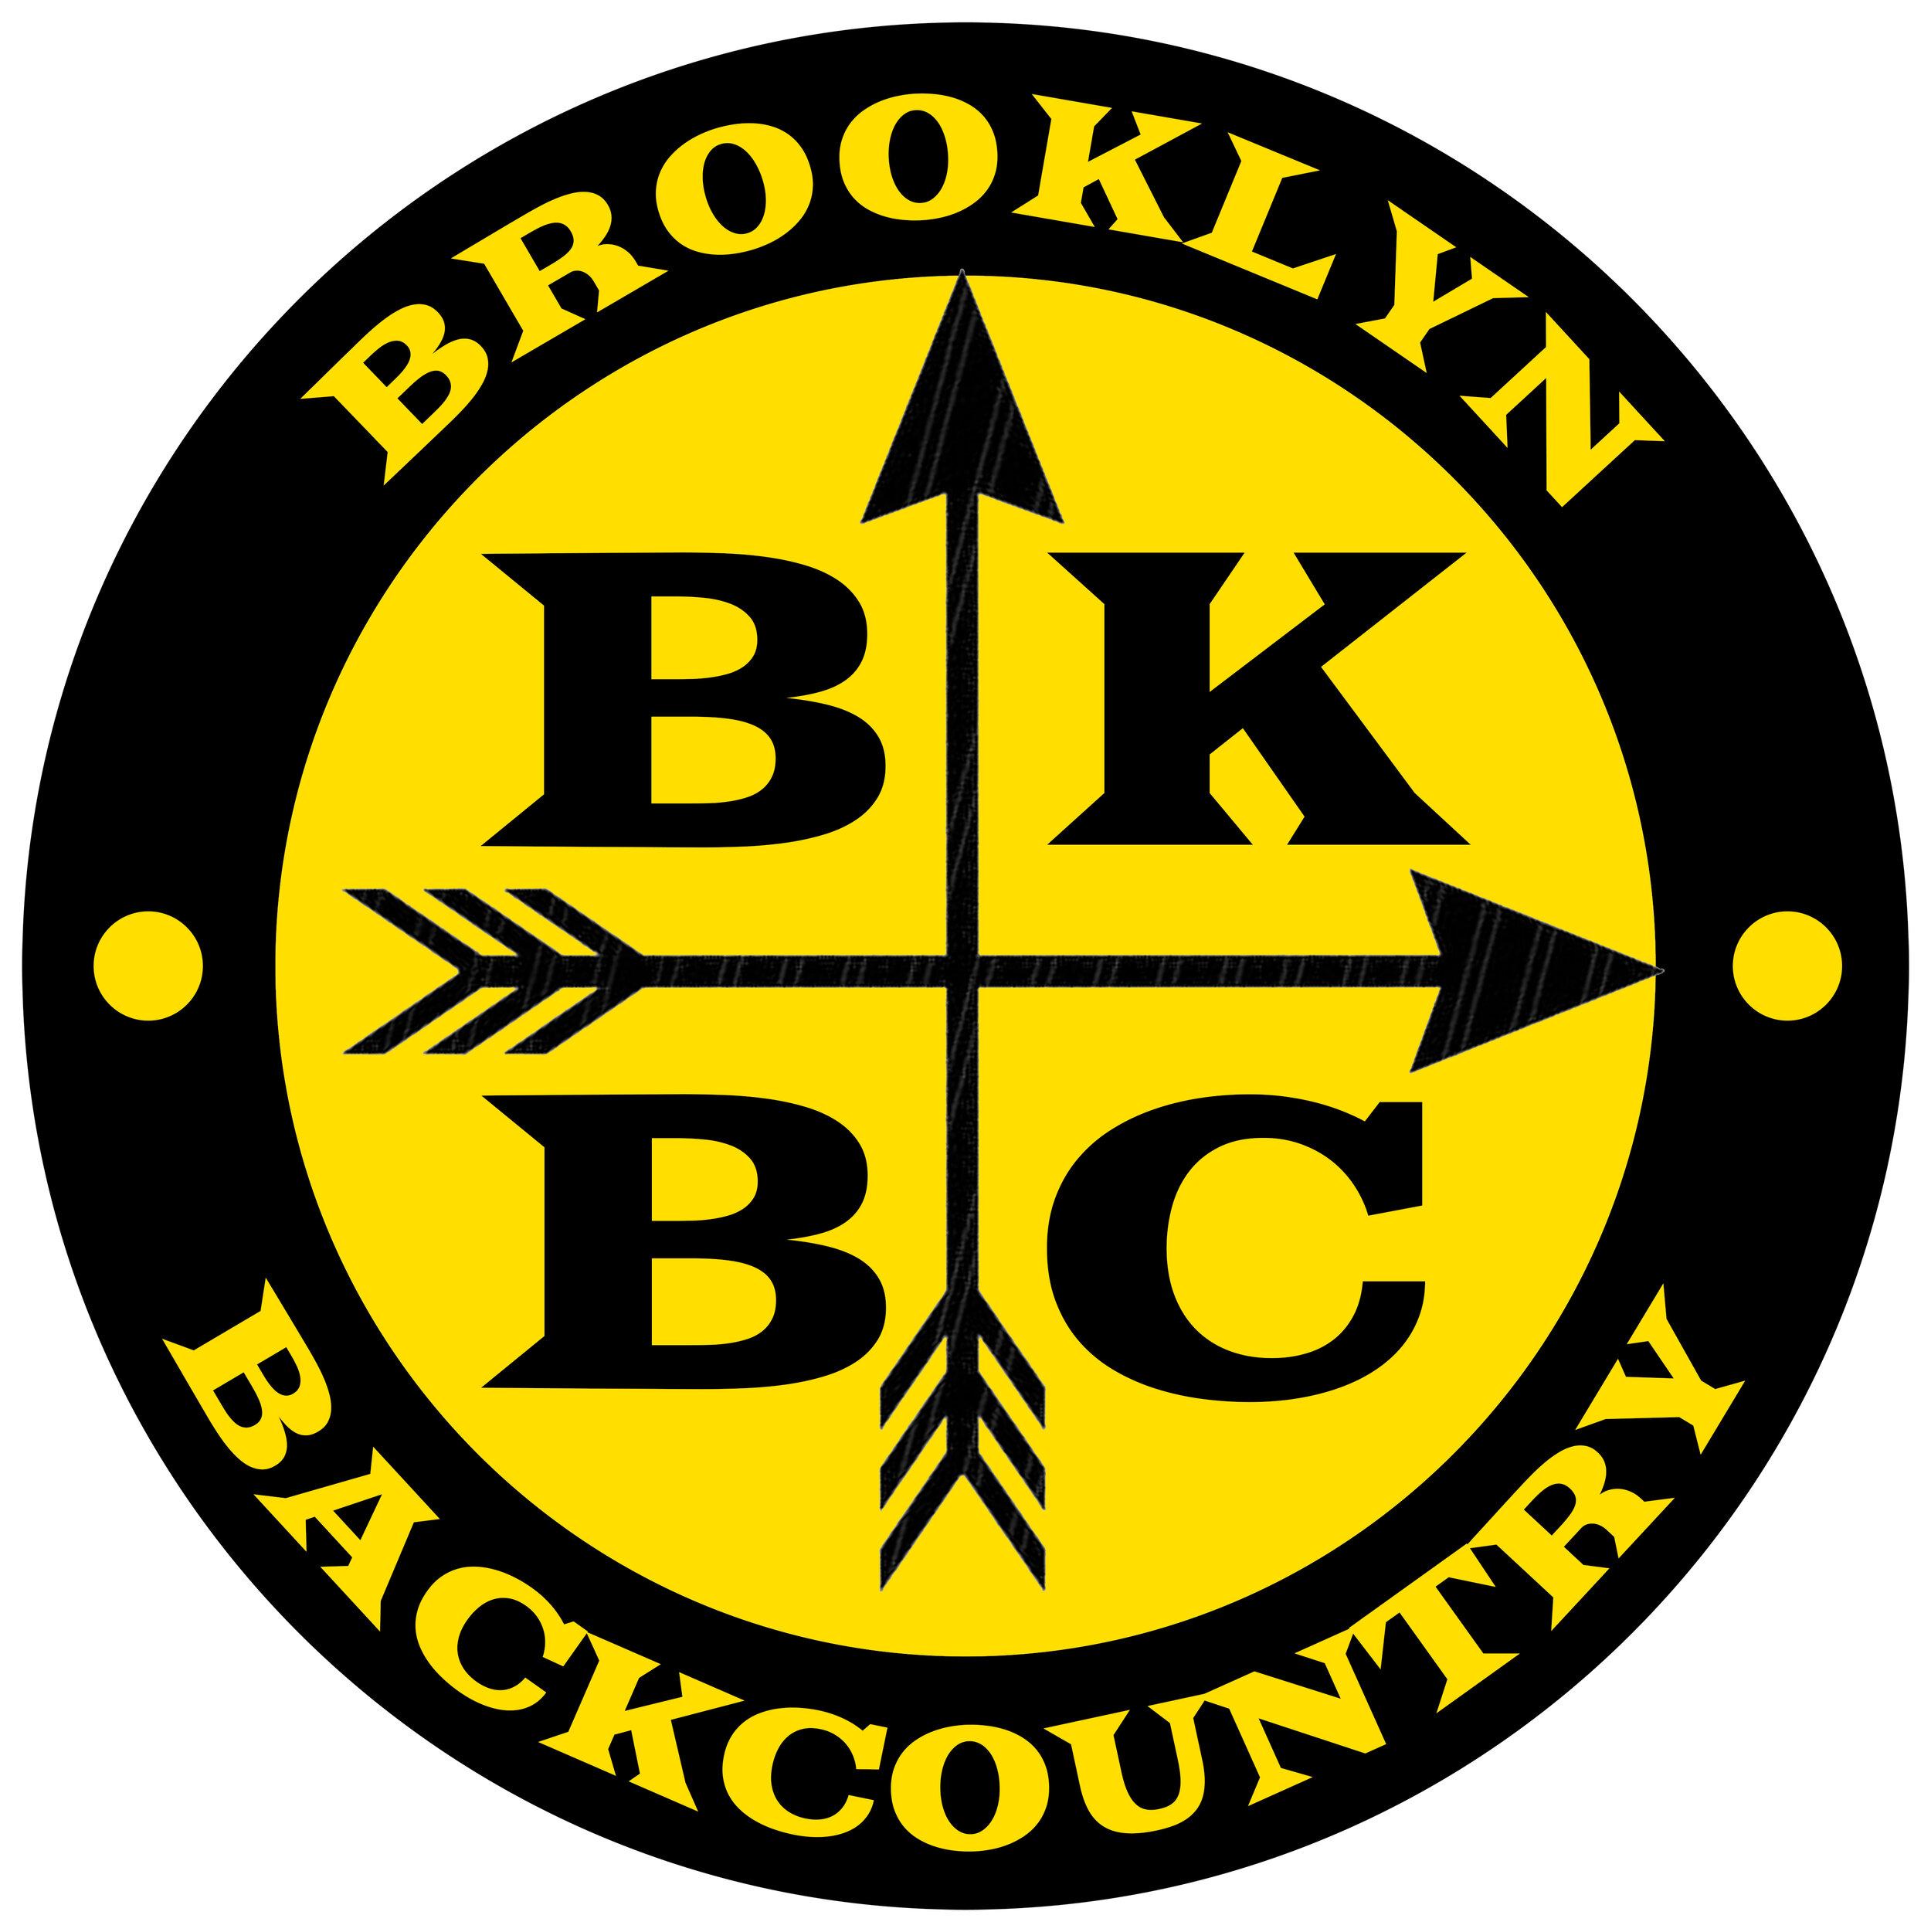 Brooklyn Backcountry logo 01.jpg